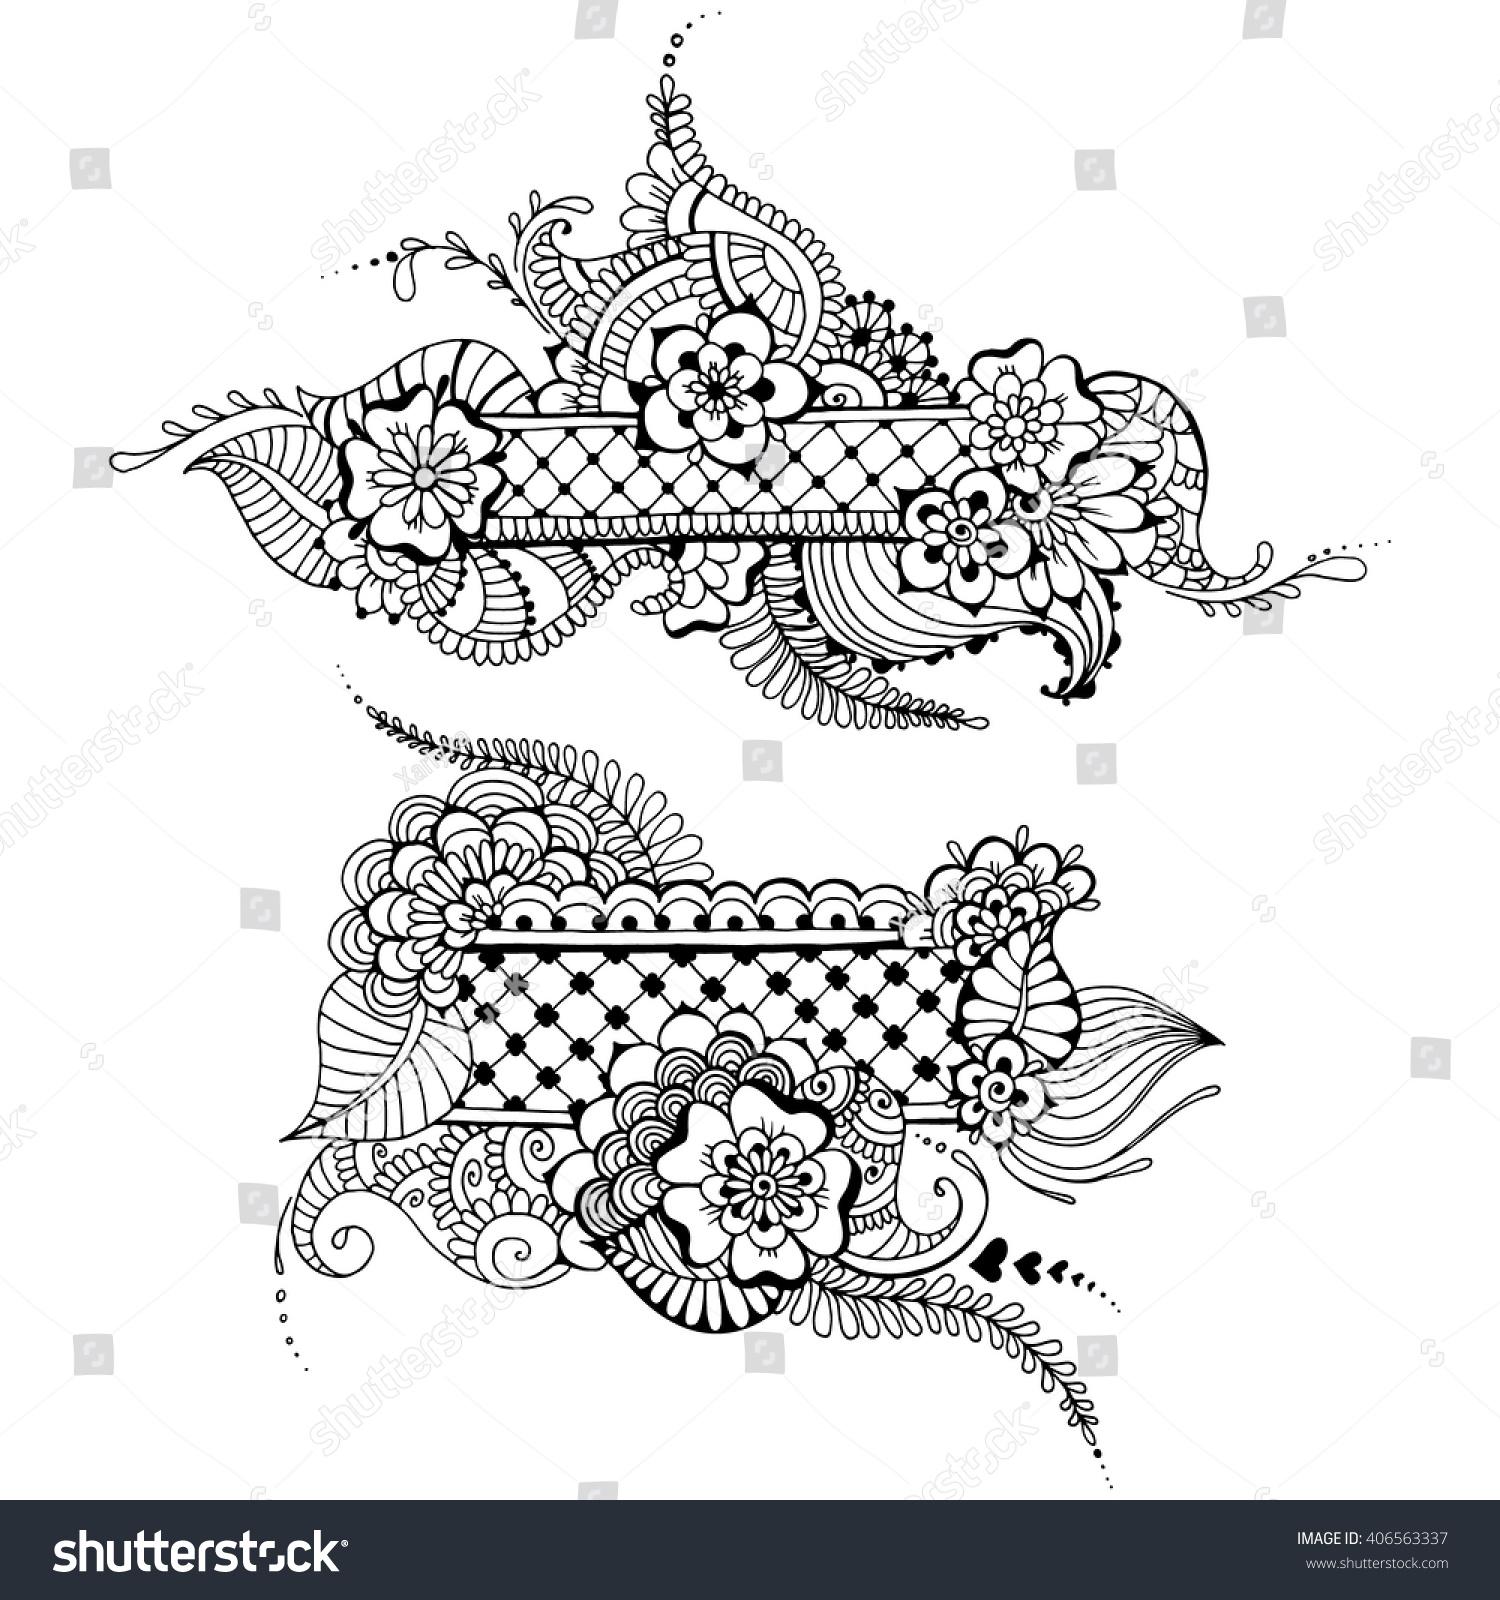 Templates Tattoo Design Mehndi Elements Floral Stock Vector ...